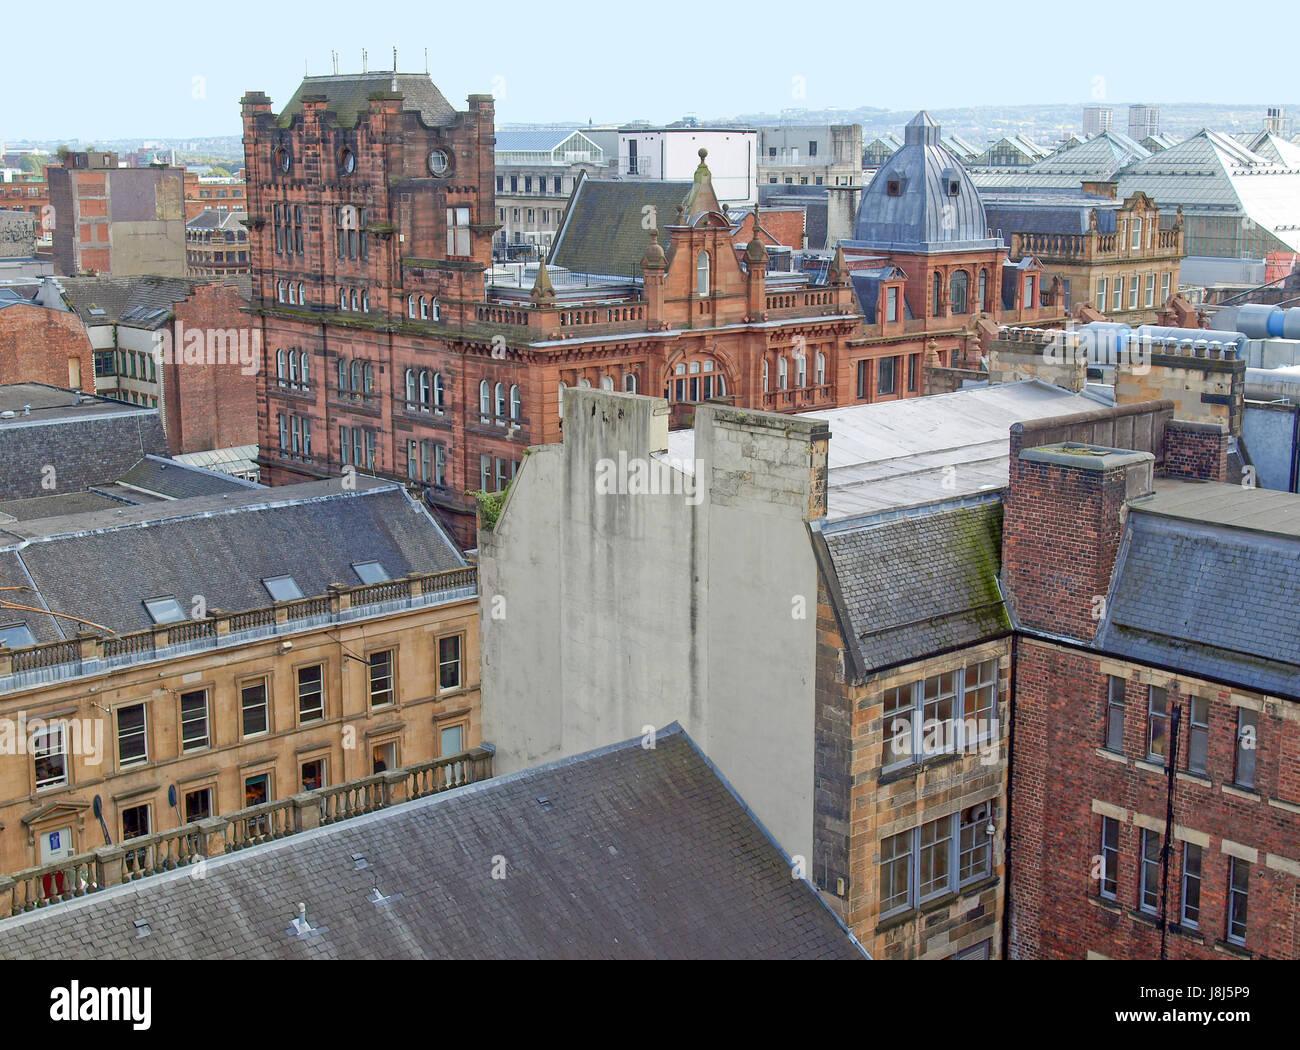 city, town, centre, center, britain, kingdom, aerial, glasgow, city, town, - Stock Image